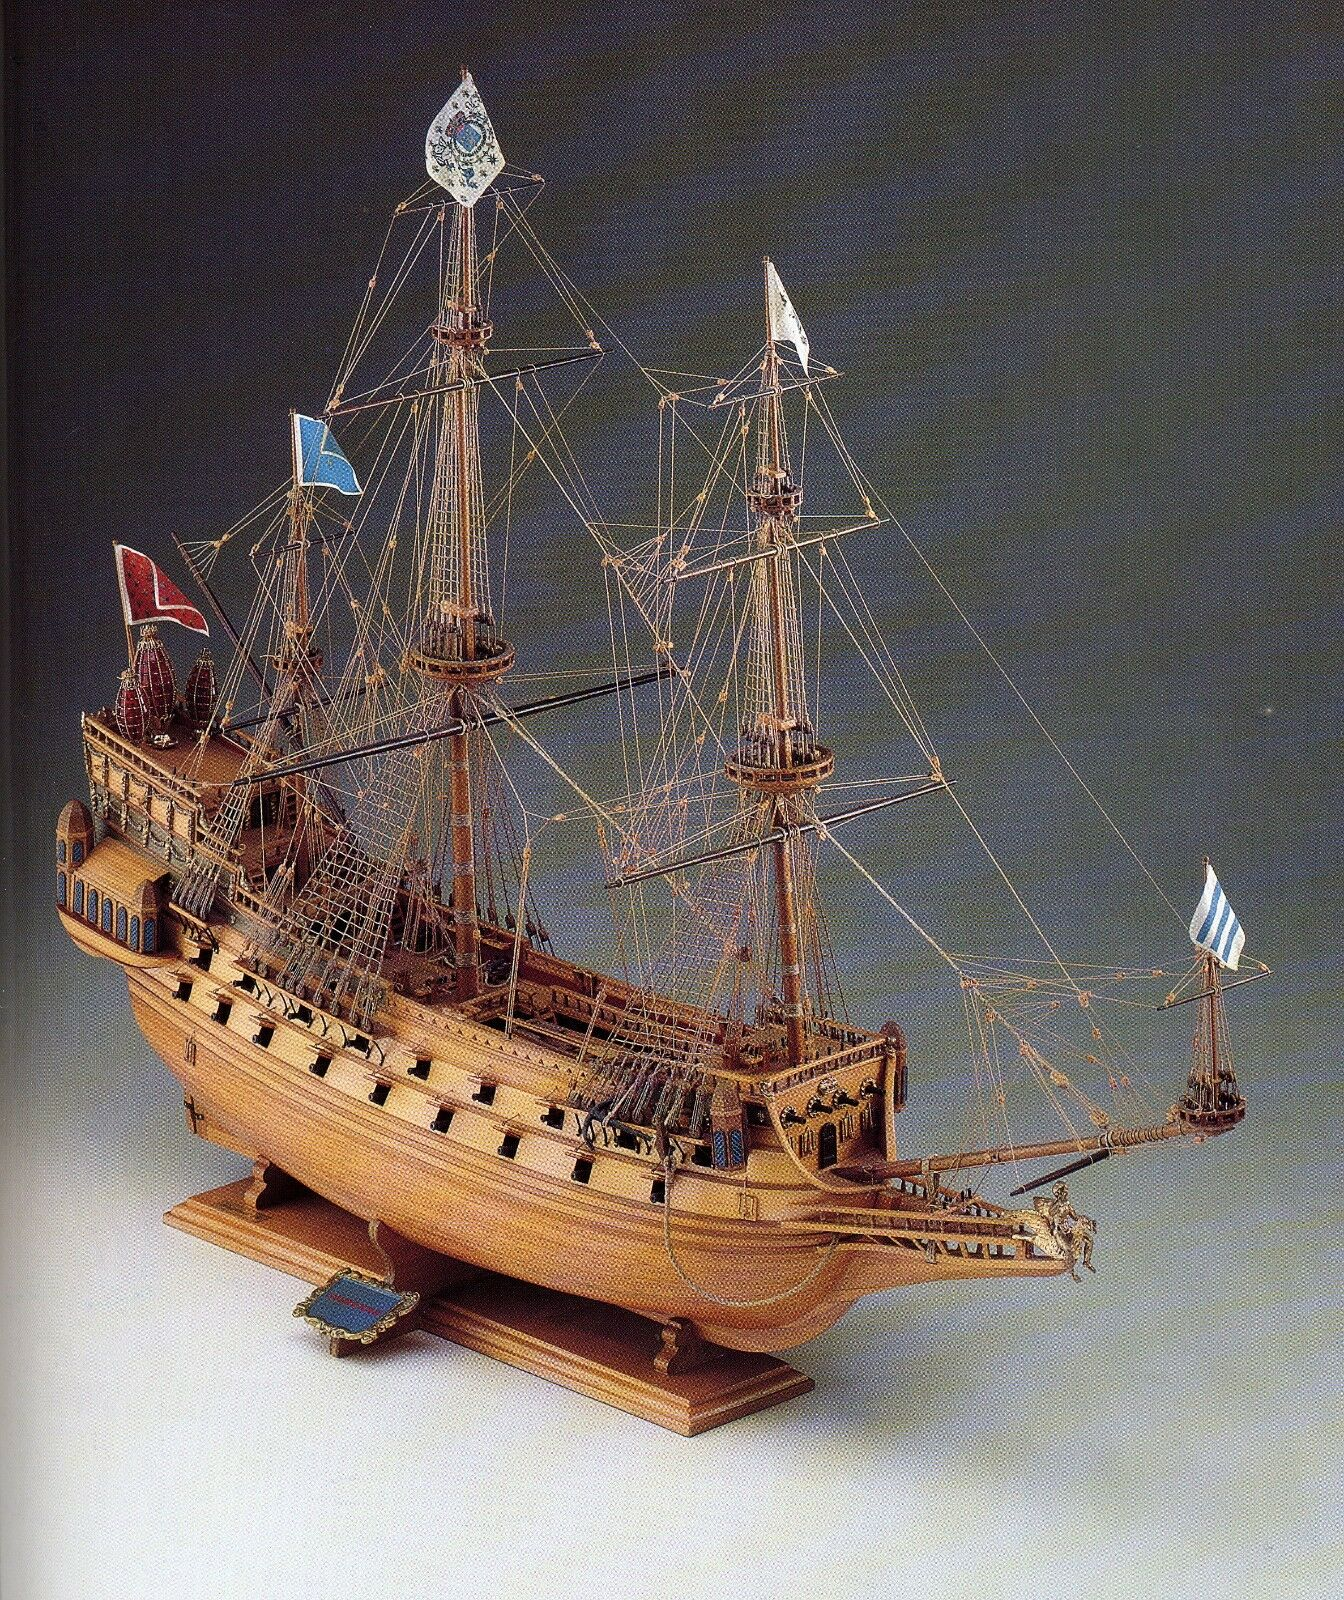 COREL SM17 BARCA Modello imbarcazione Nave COURONNE VASCELLO francese 1 100